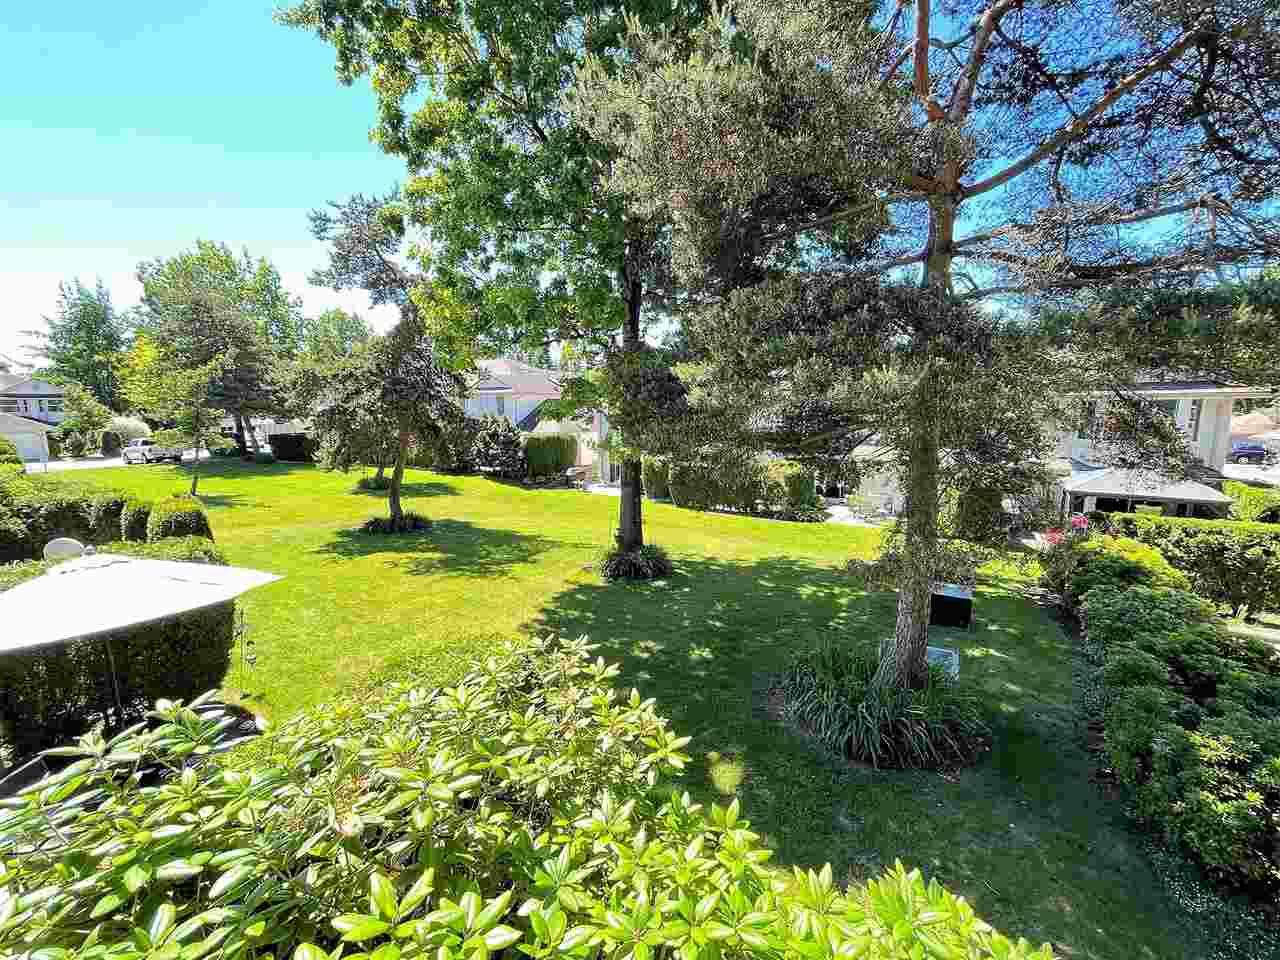 104 9045 WALNUT GROVE DRIVE - Walnut Grove Townhouse for sale, 3 Bedrooms (R2588351) #29